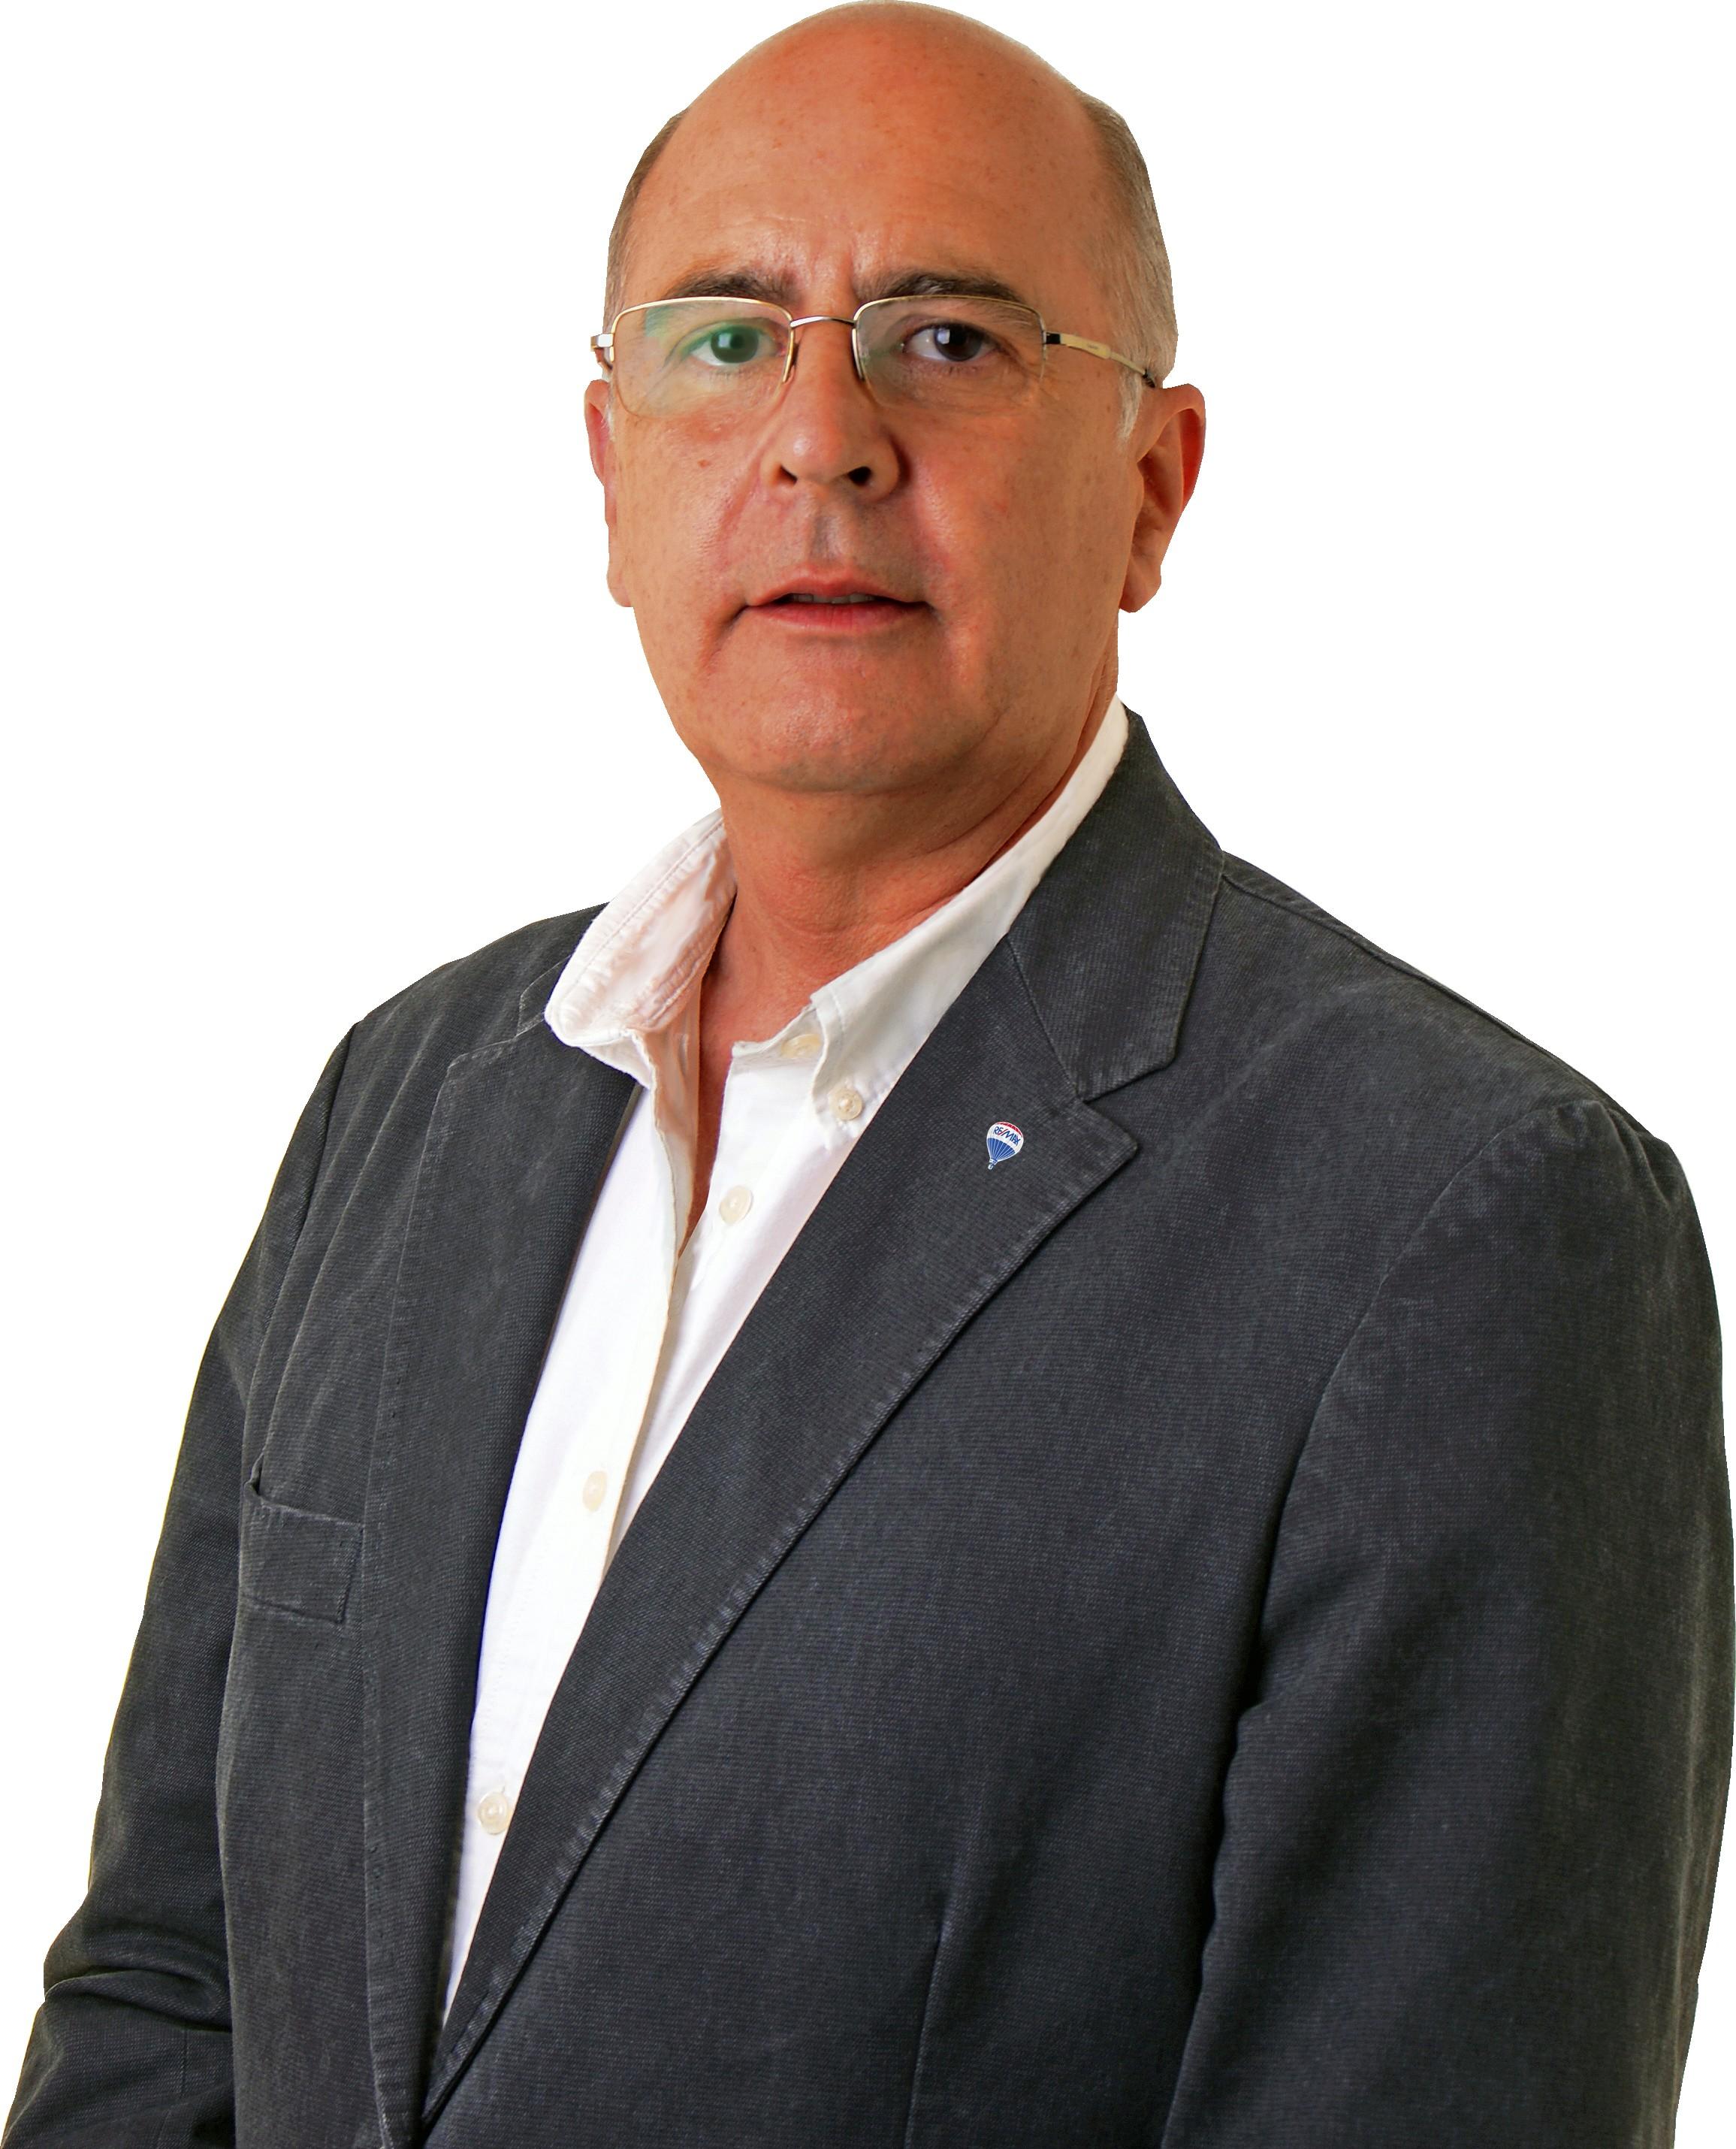 Manuel Prats  Navarro